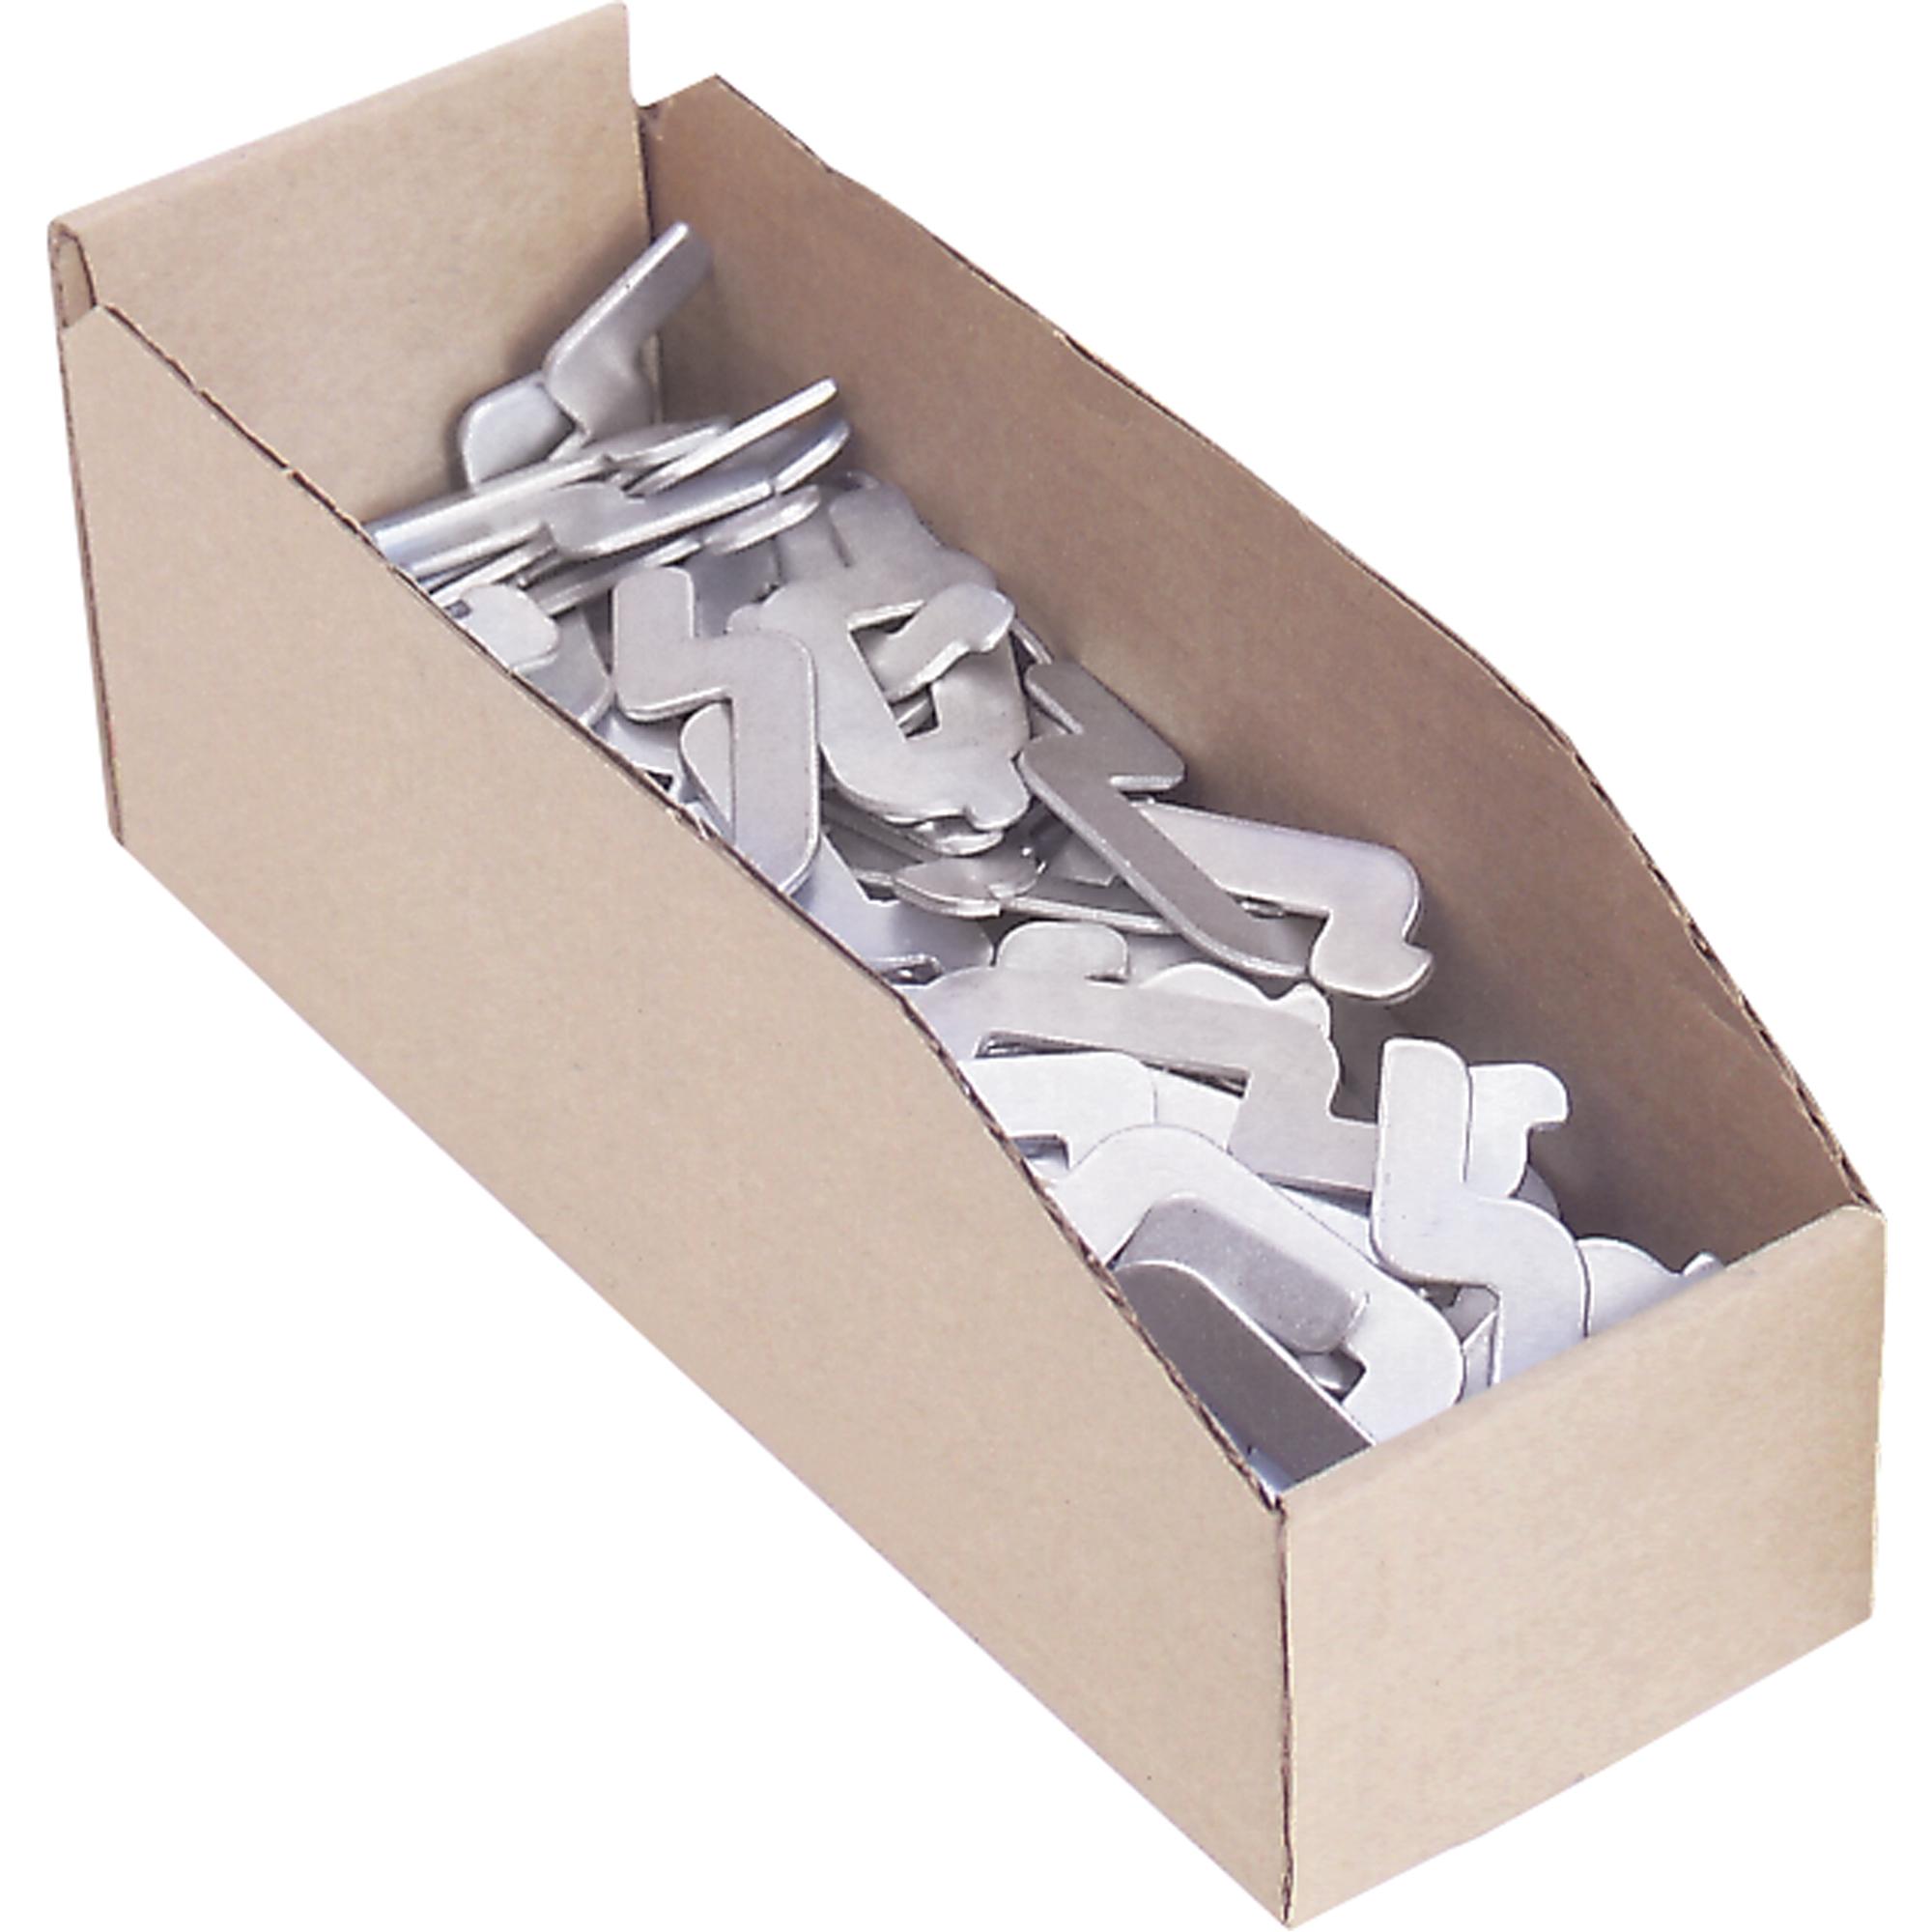 "Cardinal Boxes 12"" Deep Corrugated Parts Bins, 12"" W x 12"" D x 4-1/2"" H, Beige"